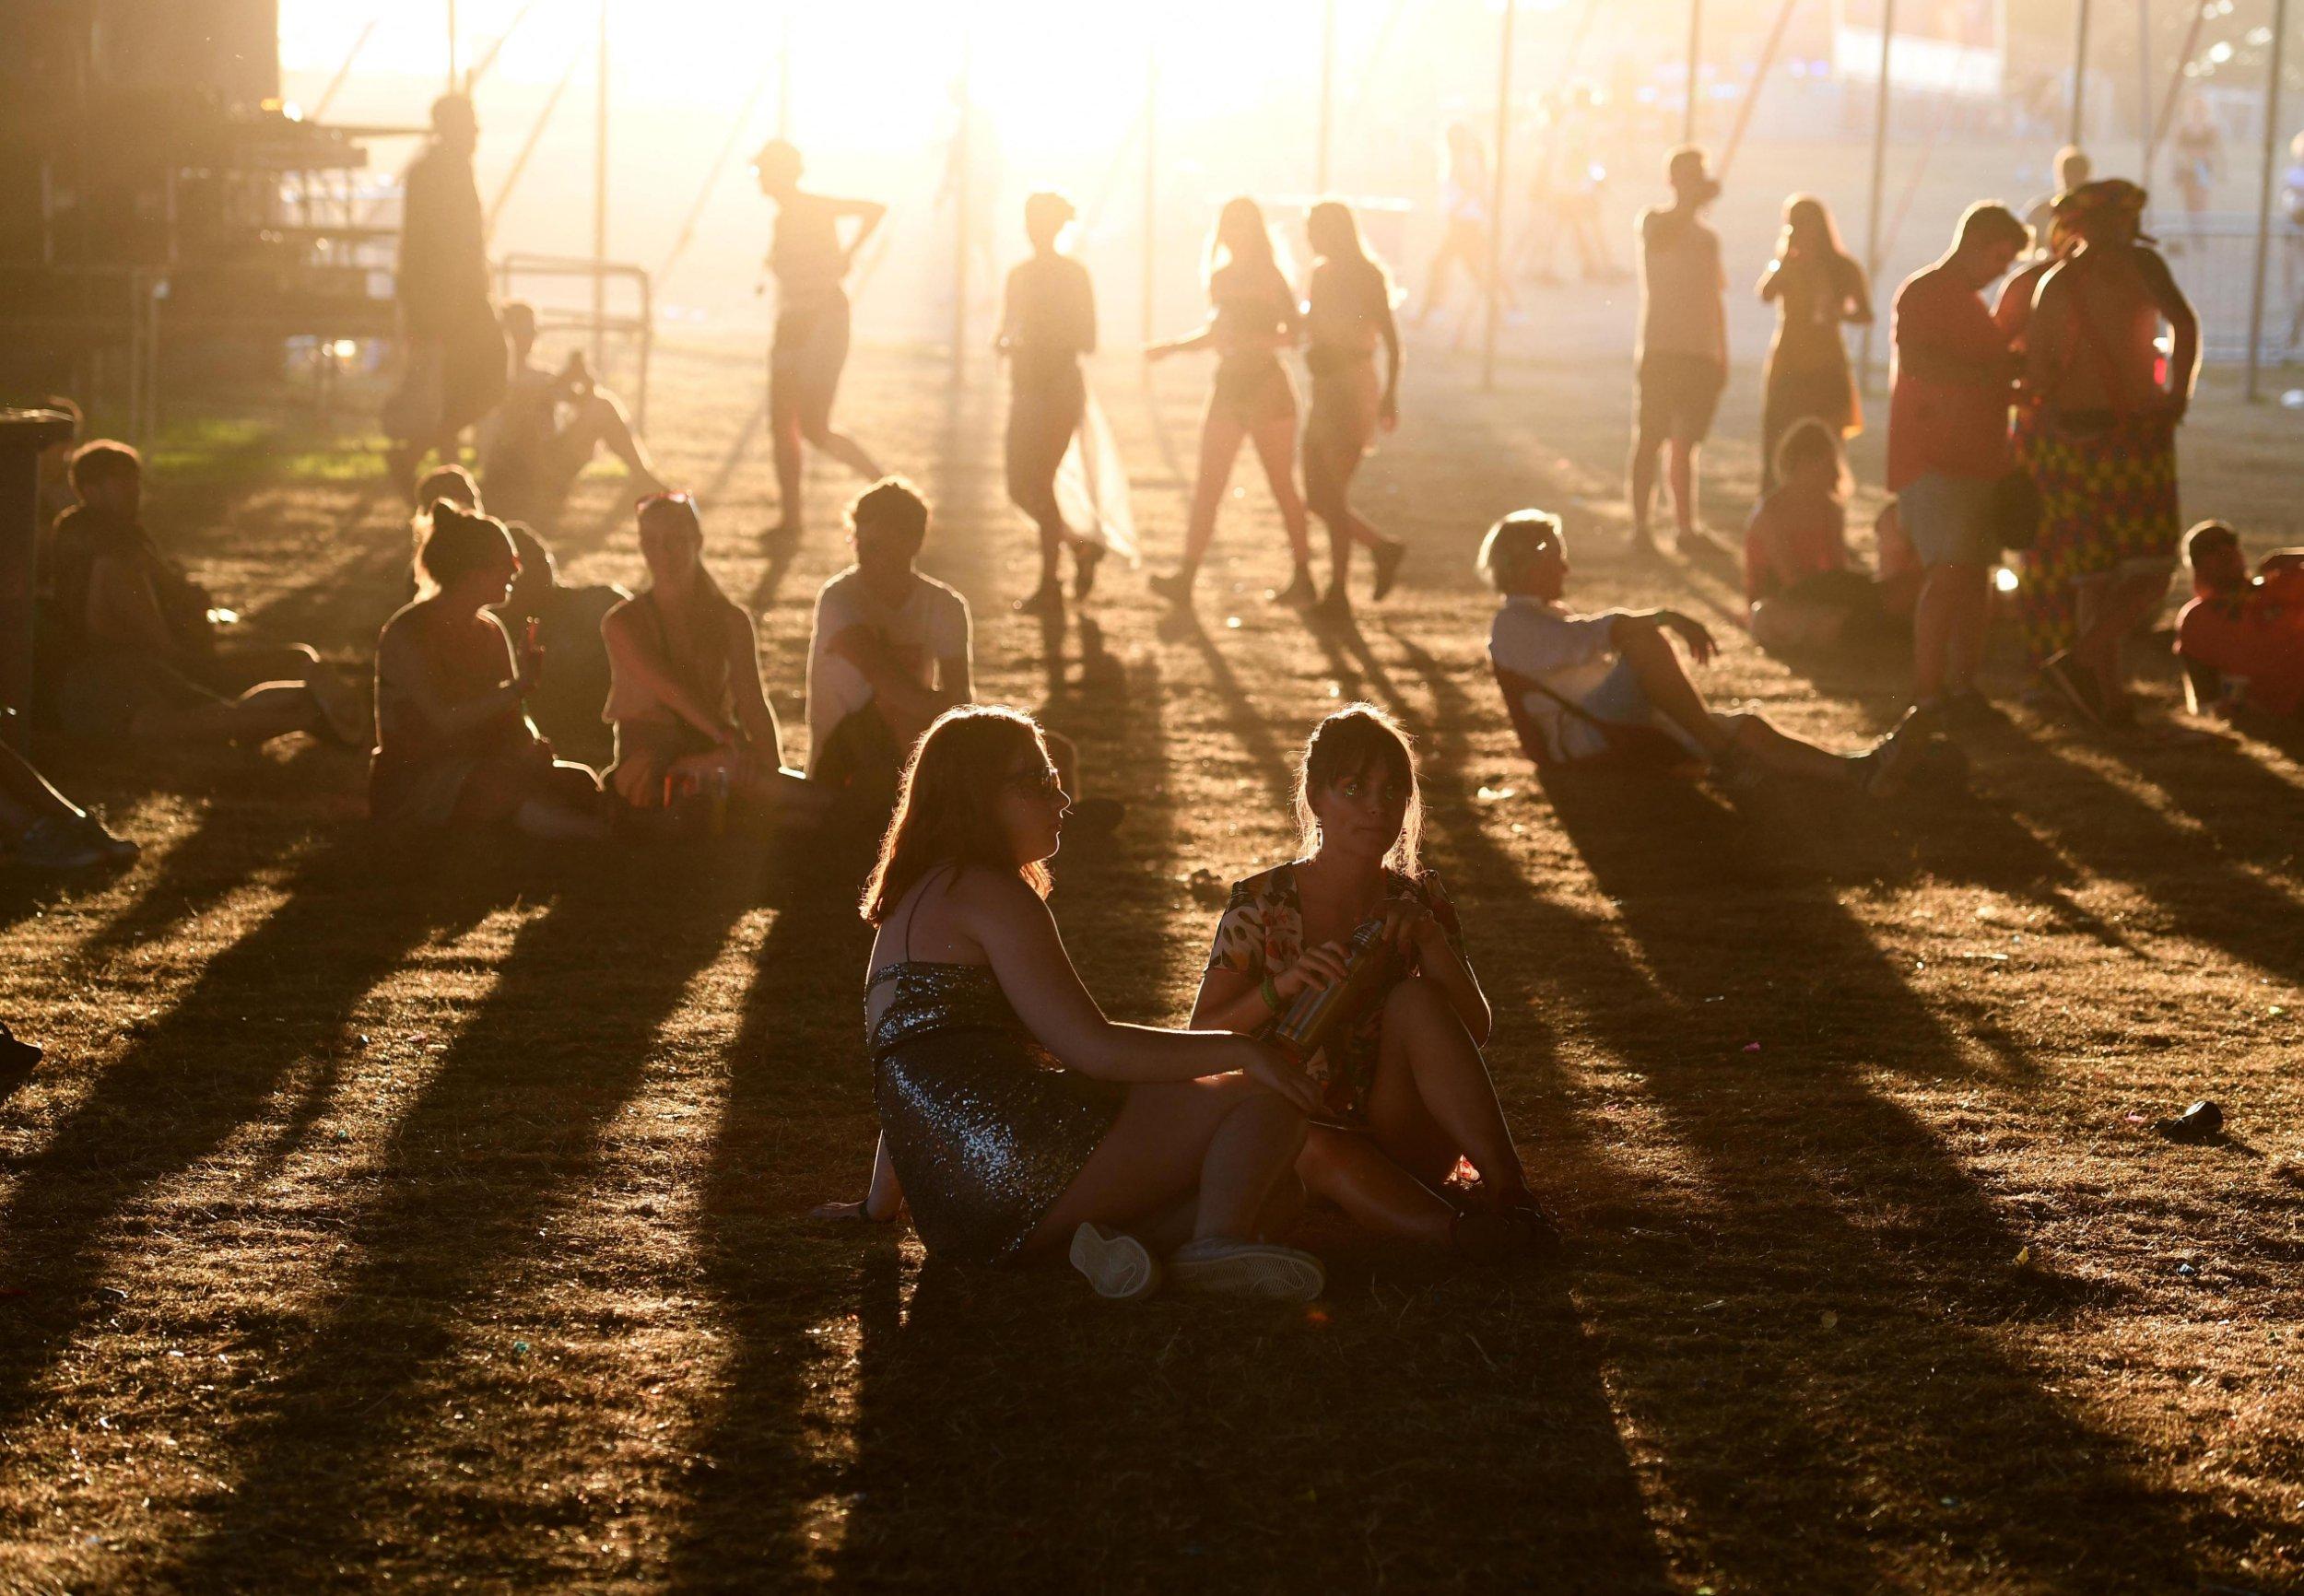 Mandatory Credit: Photo by Finbarr Webster/REX/Shutterstock (9779730cc) Festival goers at sunset Bestival, Dorset - 04 Aug 2018